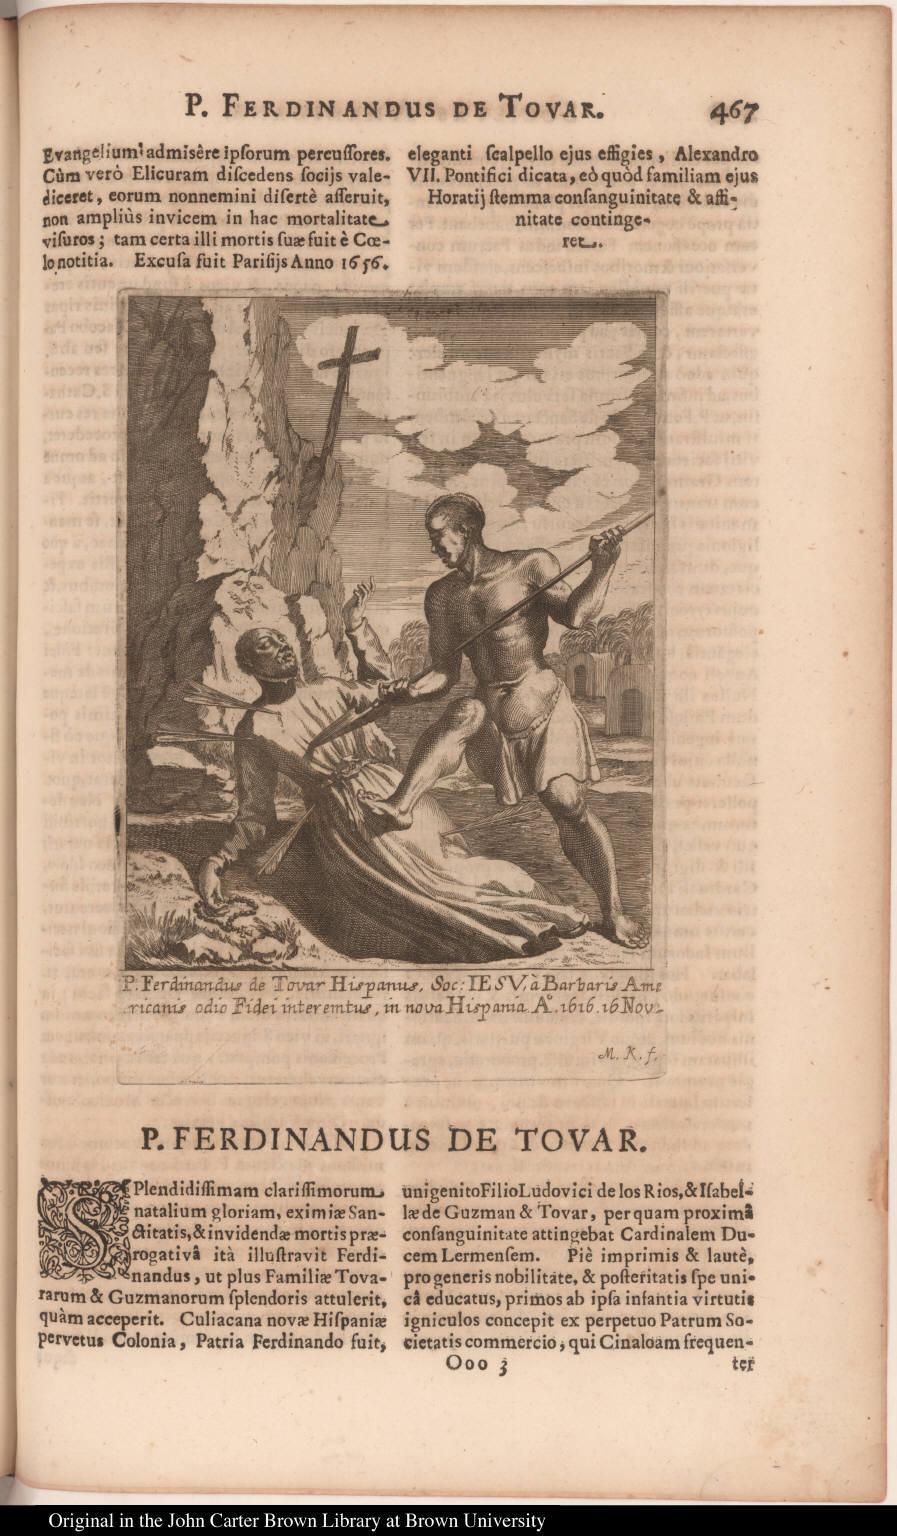 P. Ferdinandus de Tovar Hispanus, Soc: Iesu, à Barbaris Americanis odio Fidei interemtus, in nova Hispania Ao. 1616. 16 Nov: